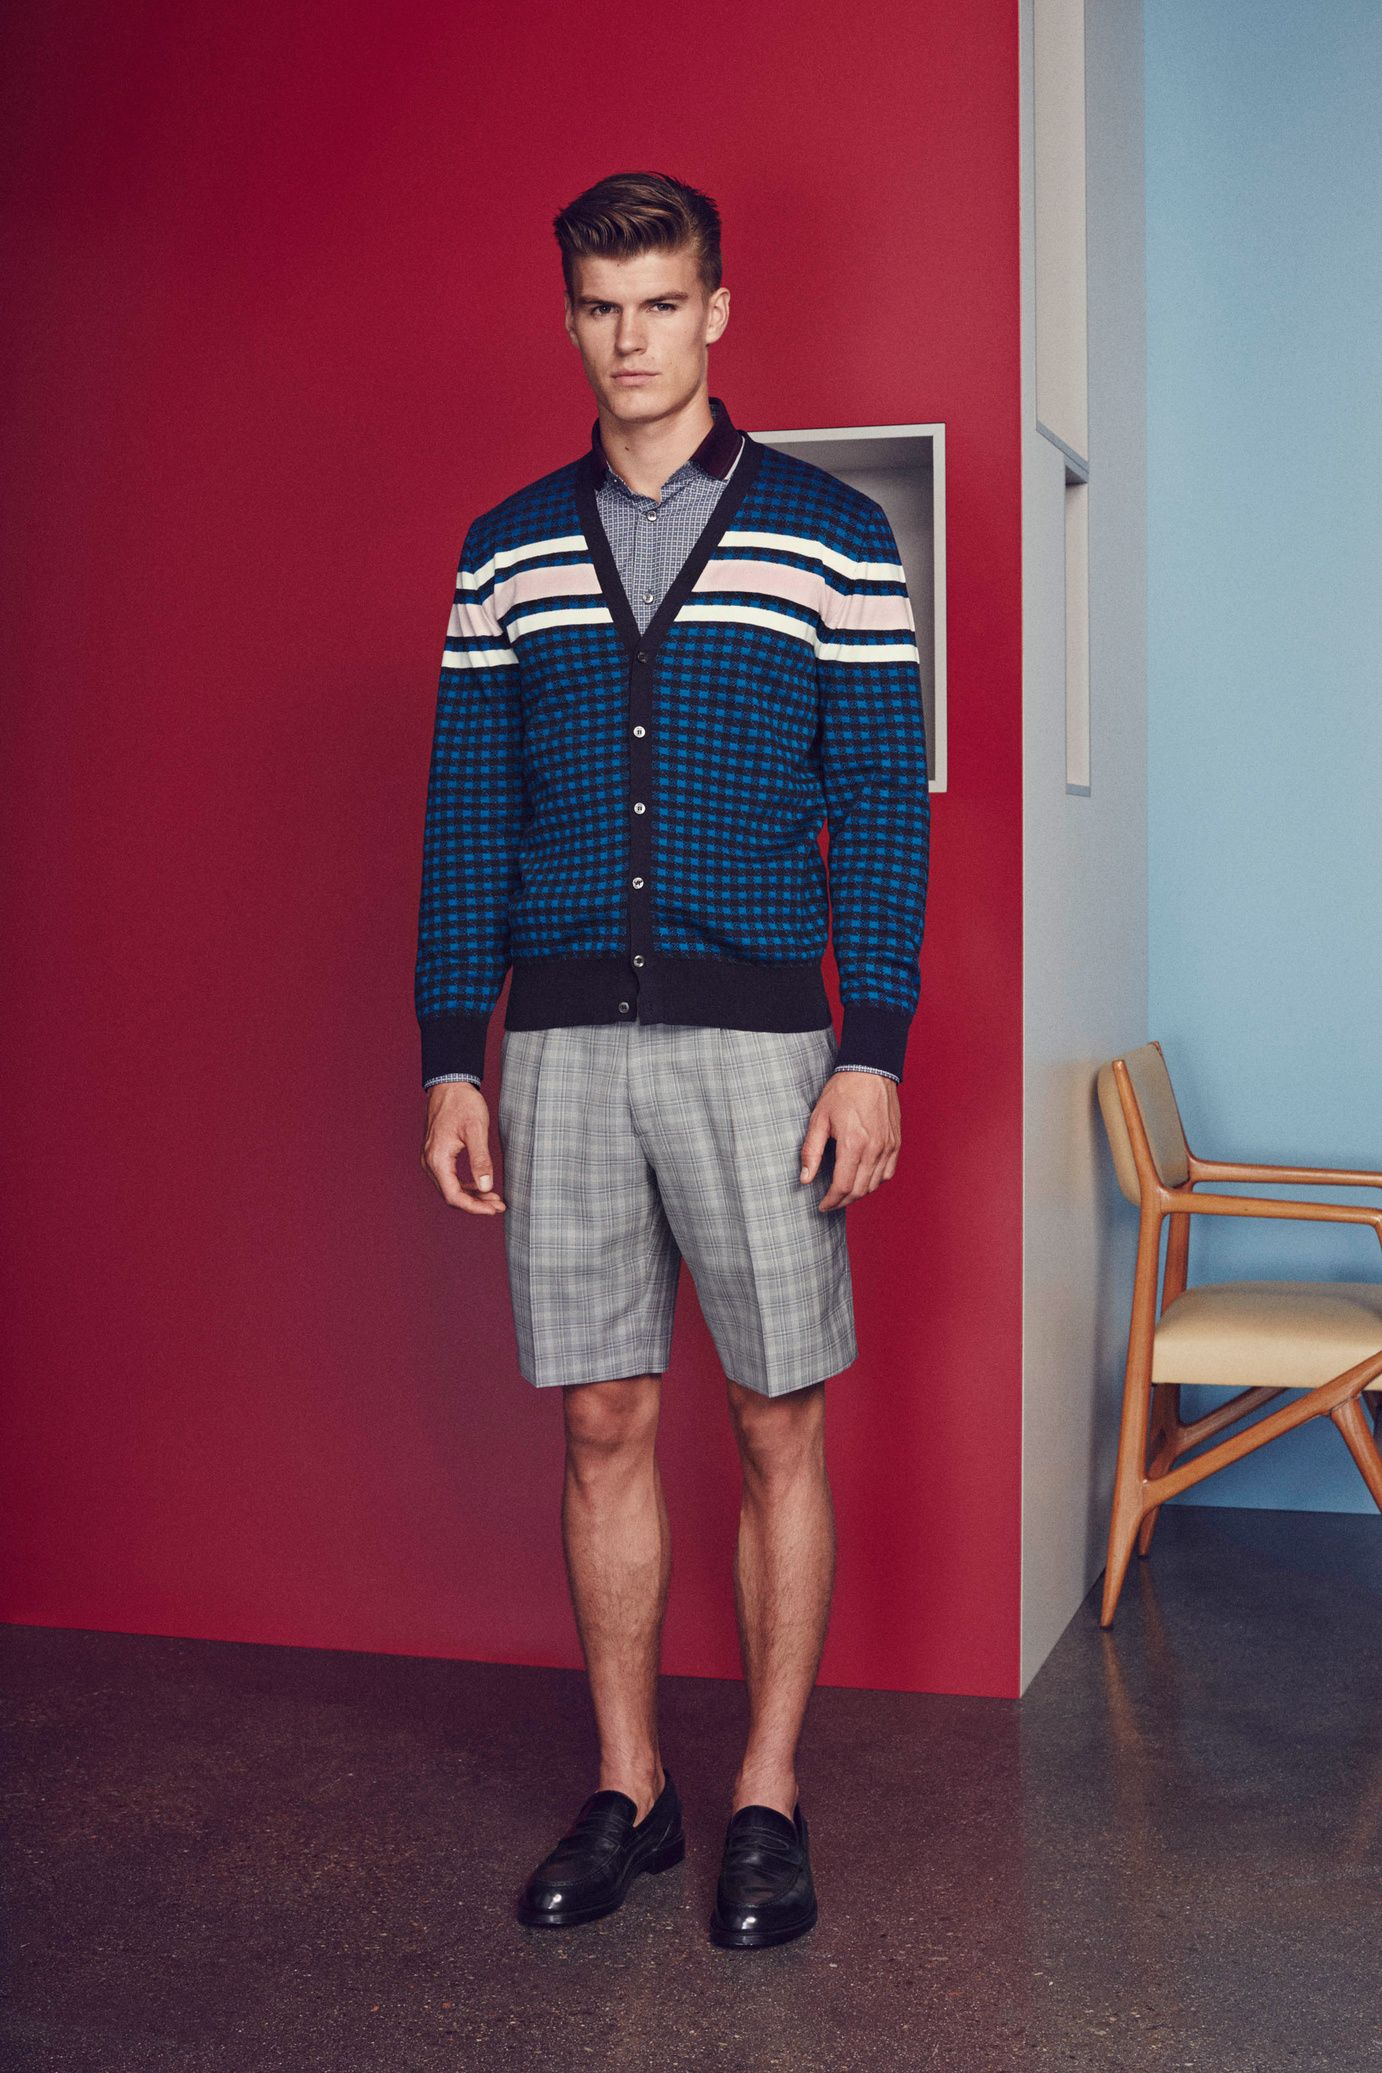 Brioni  menswear spring summer 2015 Primavera 2015 90c06692d94